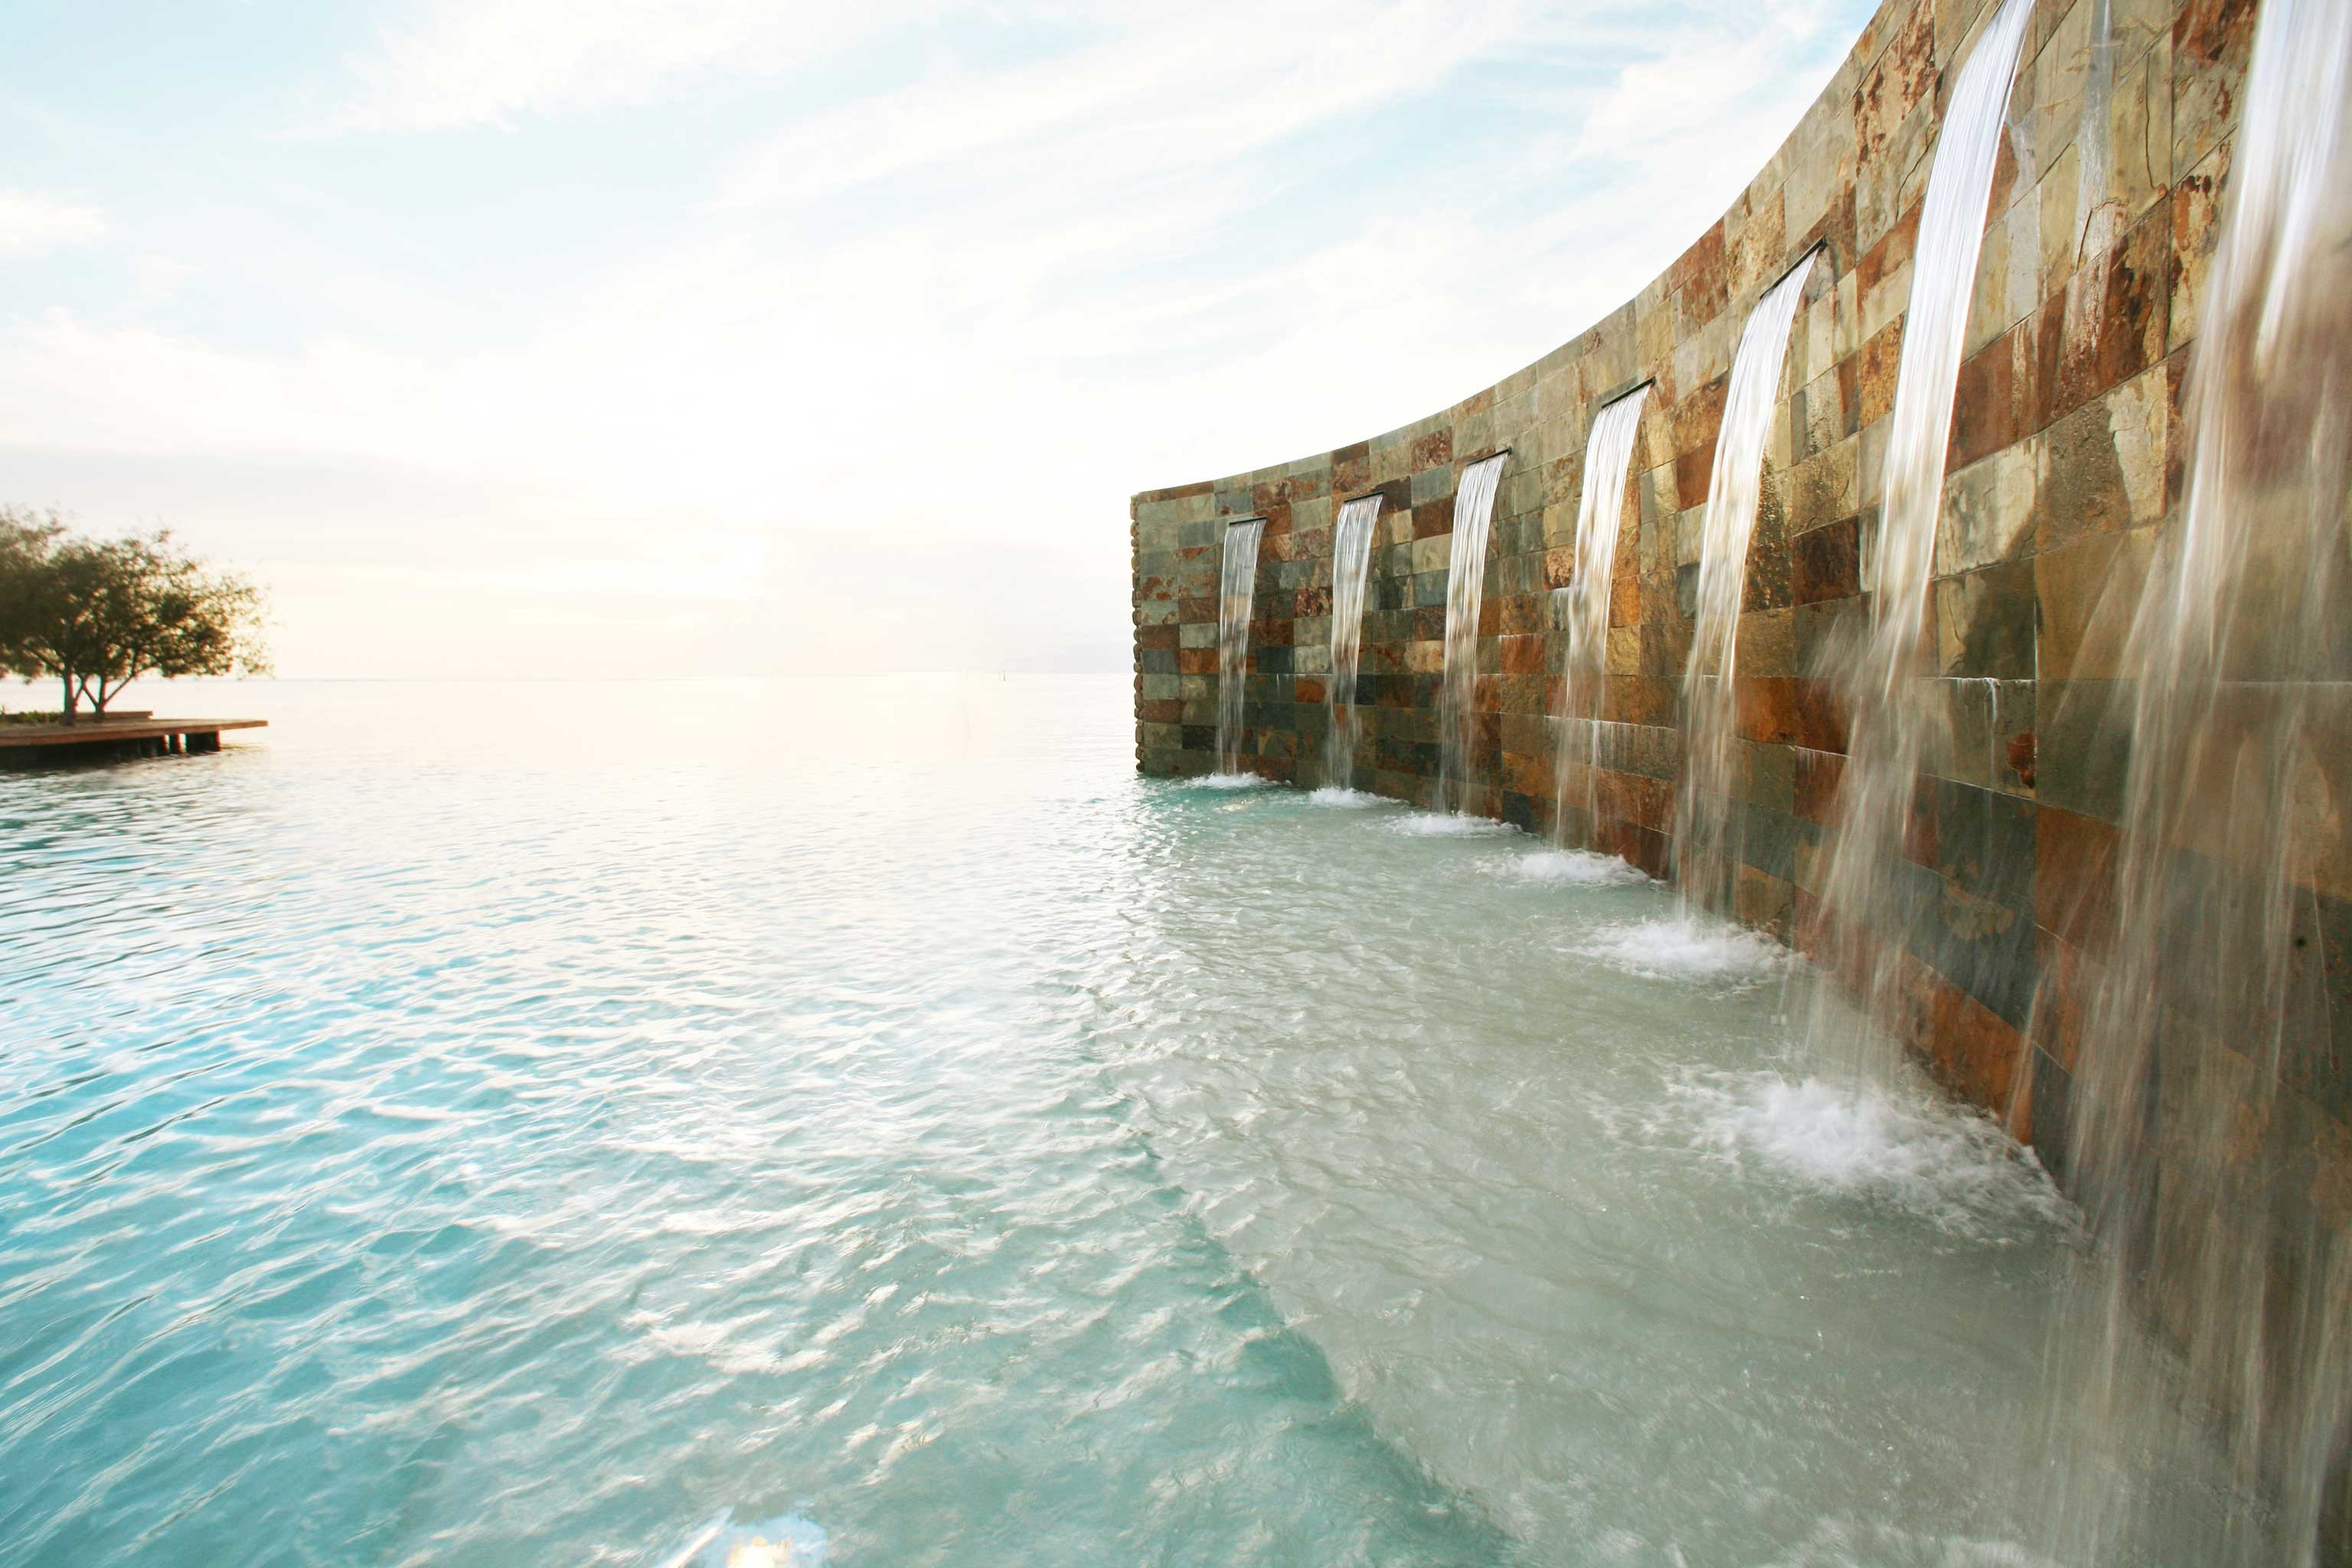 Luxury Pool Scenic views water sky Nature River Sea vehicle waterway